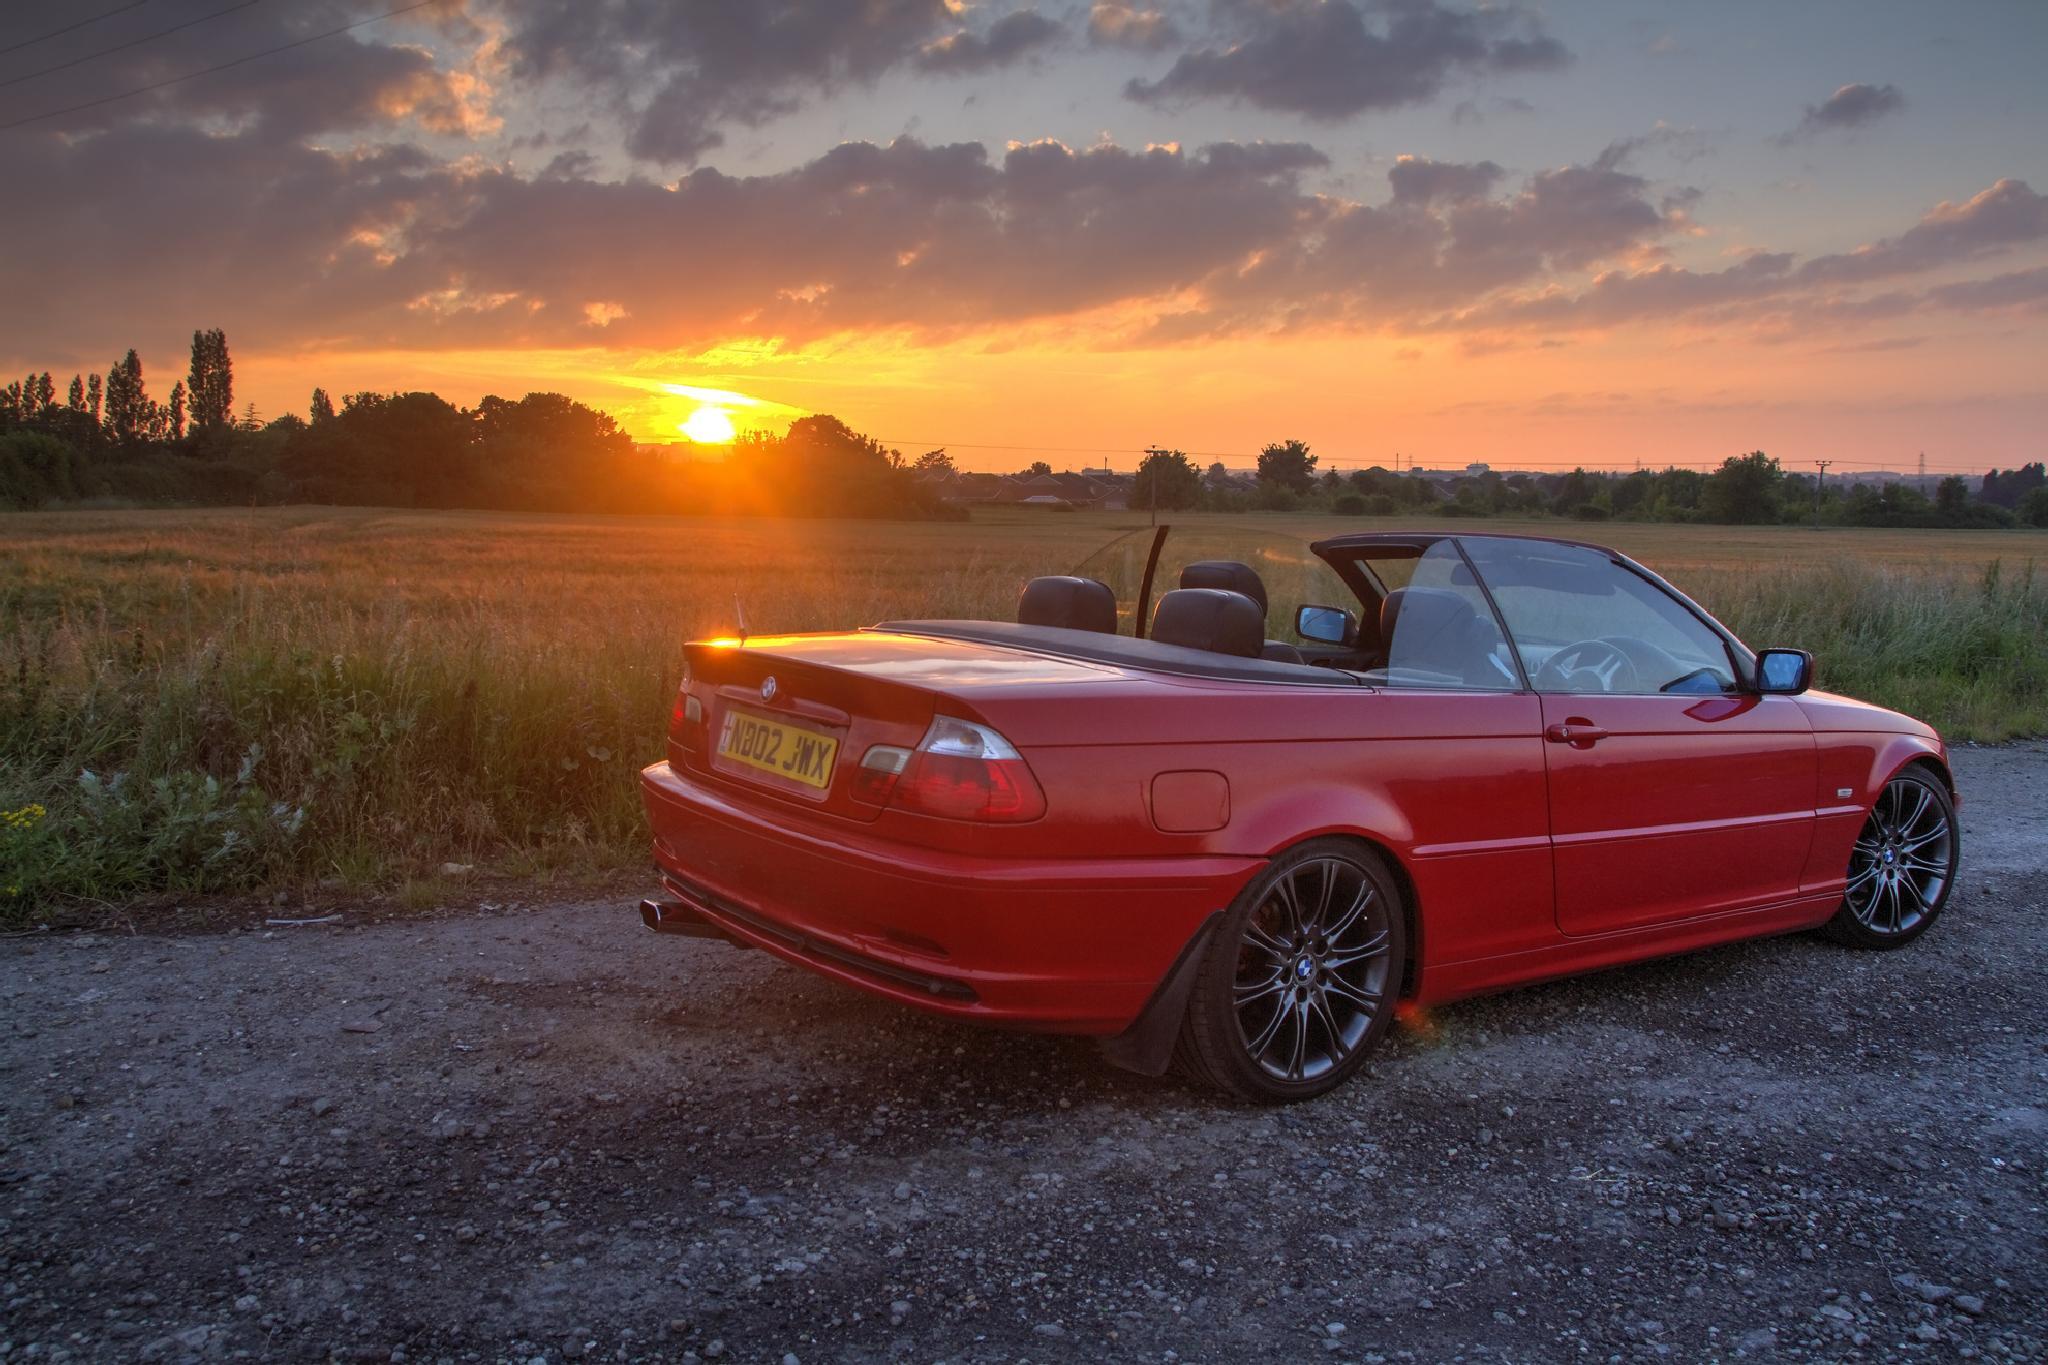 BMW SUNSET by Jason Lavine